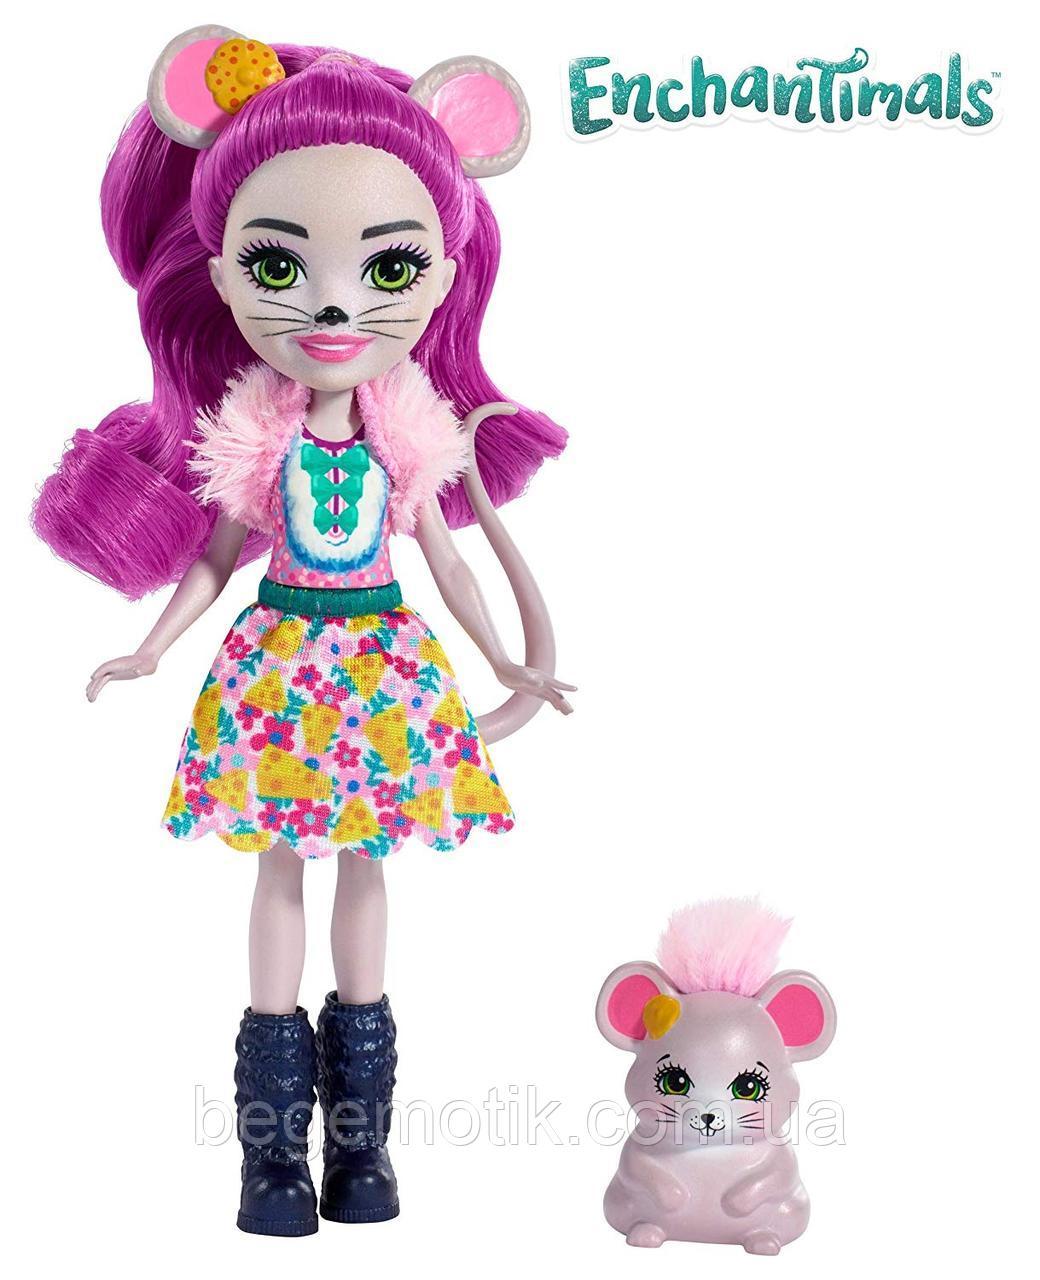 Кукла Энчантималс Мышь Майла и Питомец Фондю Enchantimals Mayla Mouse Doll & Fondue Figure (FXM76)